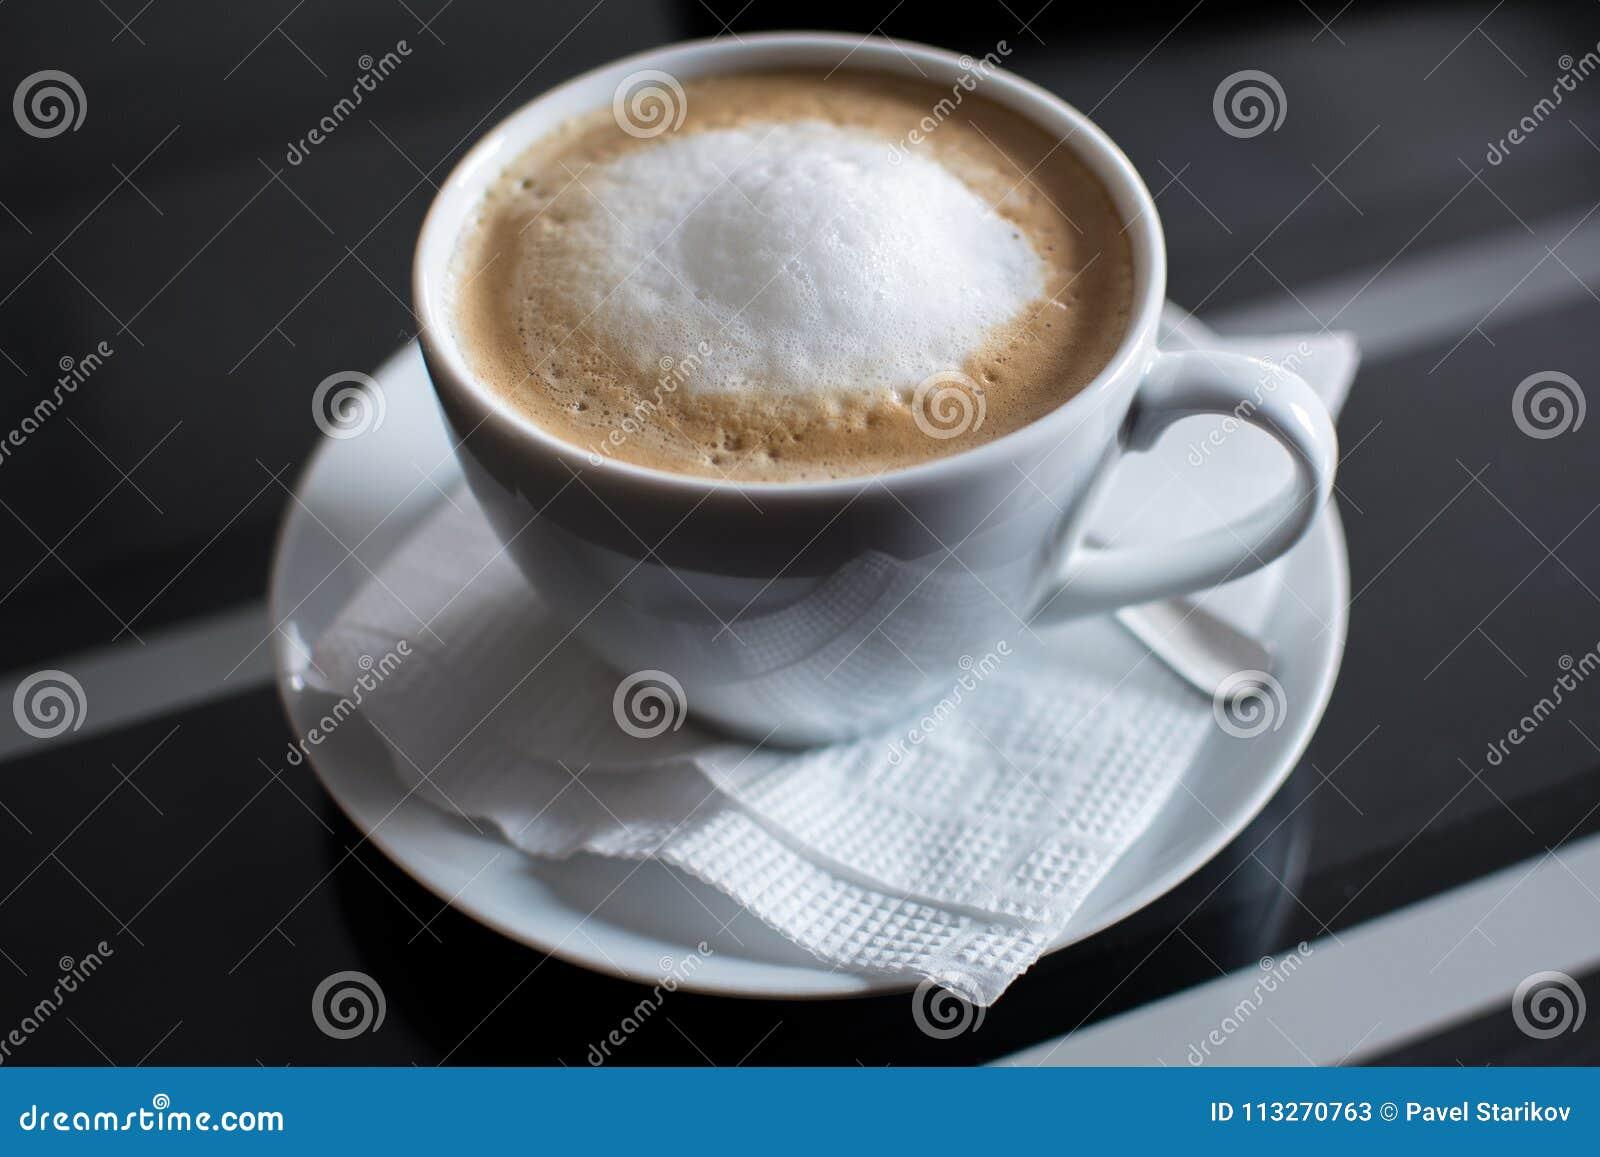 Coffe caliente, foco suave